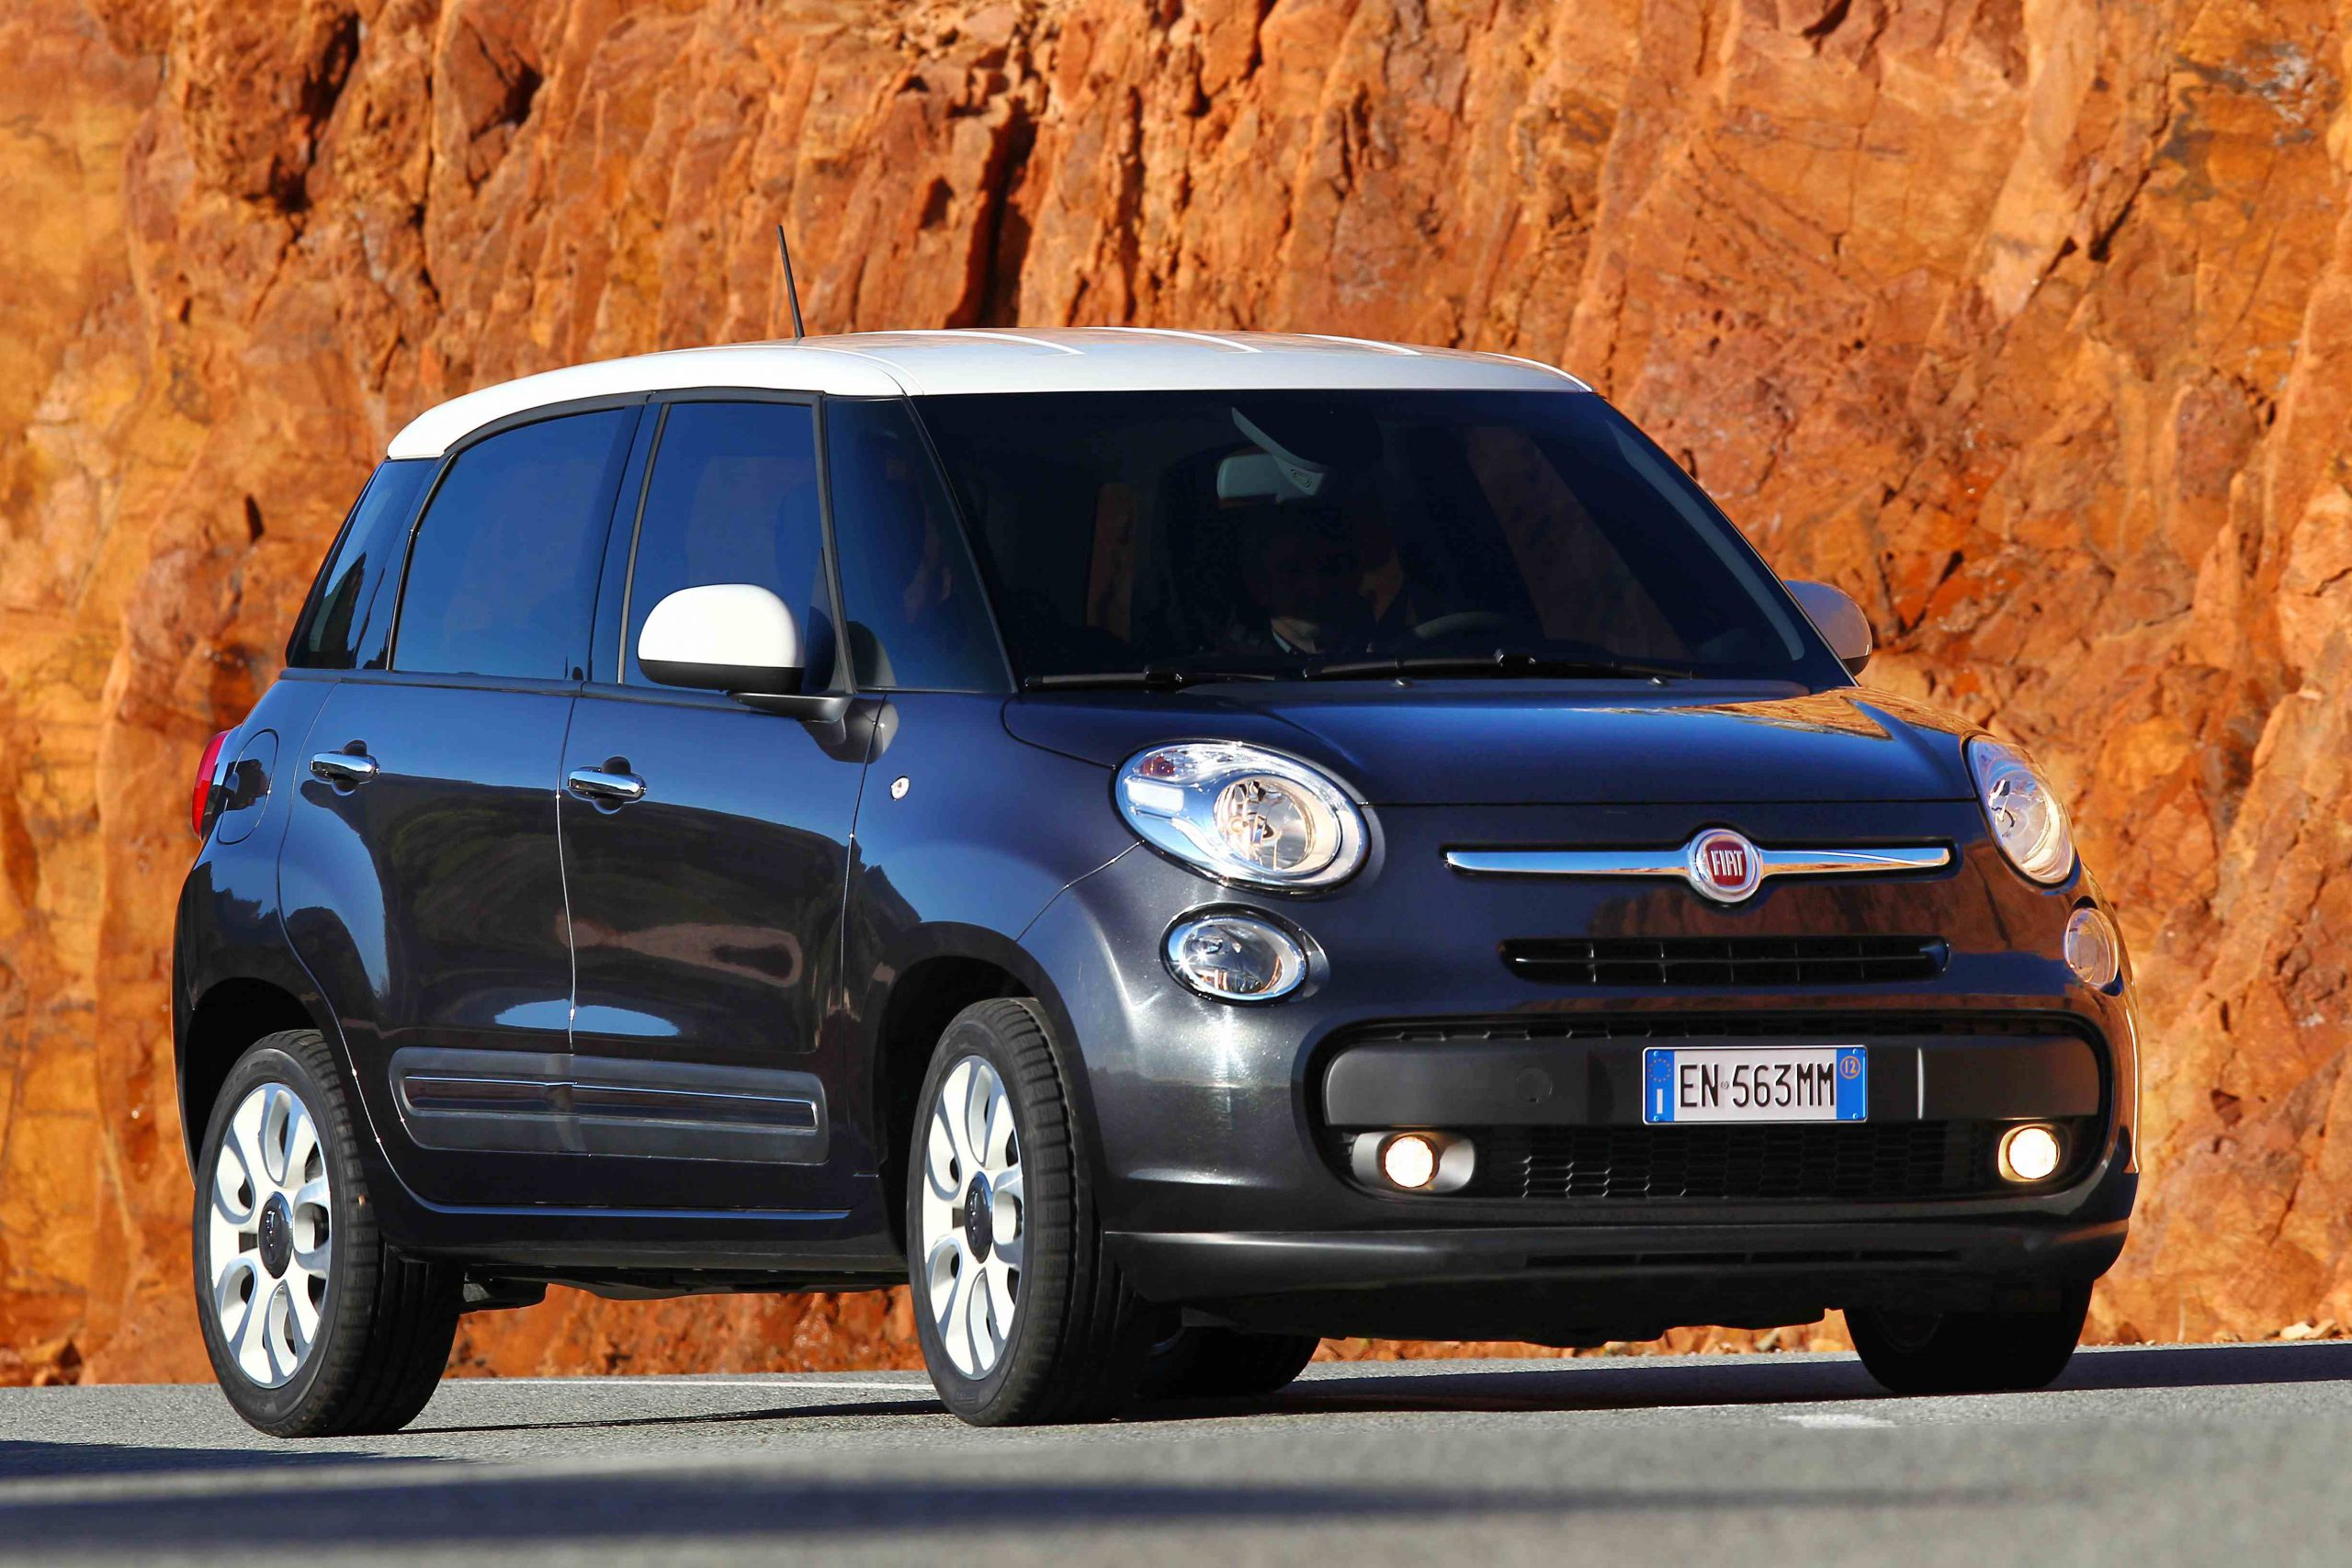 Fiat 500L 1.6 MultiJet Lounge (2014): New Car Review